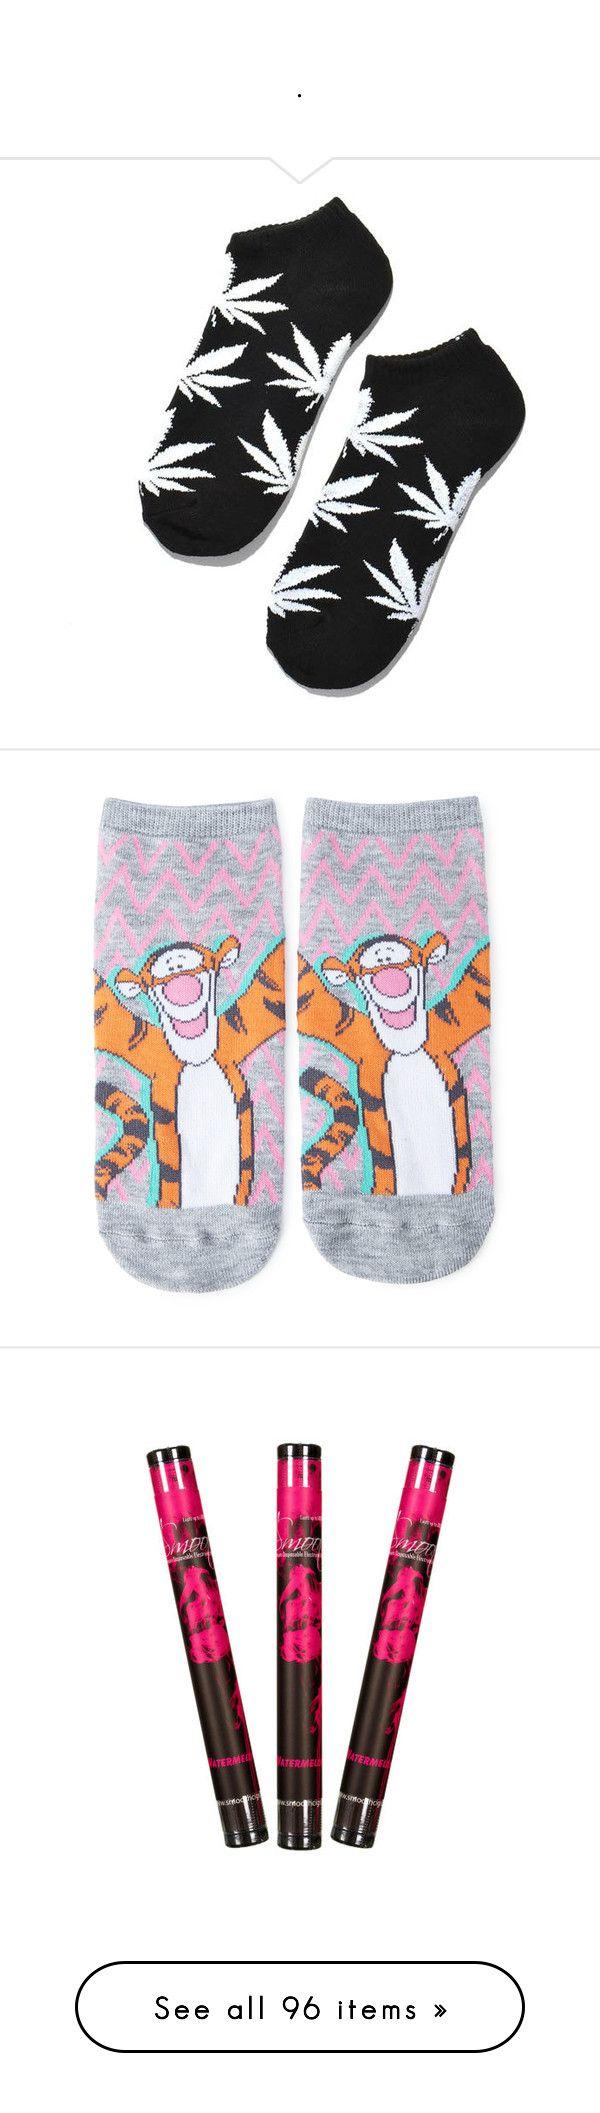 """."" by amyaxbradford ❤ liked on Polyvore featuring intimates, hosiery, socks, shoes, huf socks, huf, black and white socks, ankle socks, tennis socks and cartoon character socks"